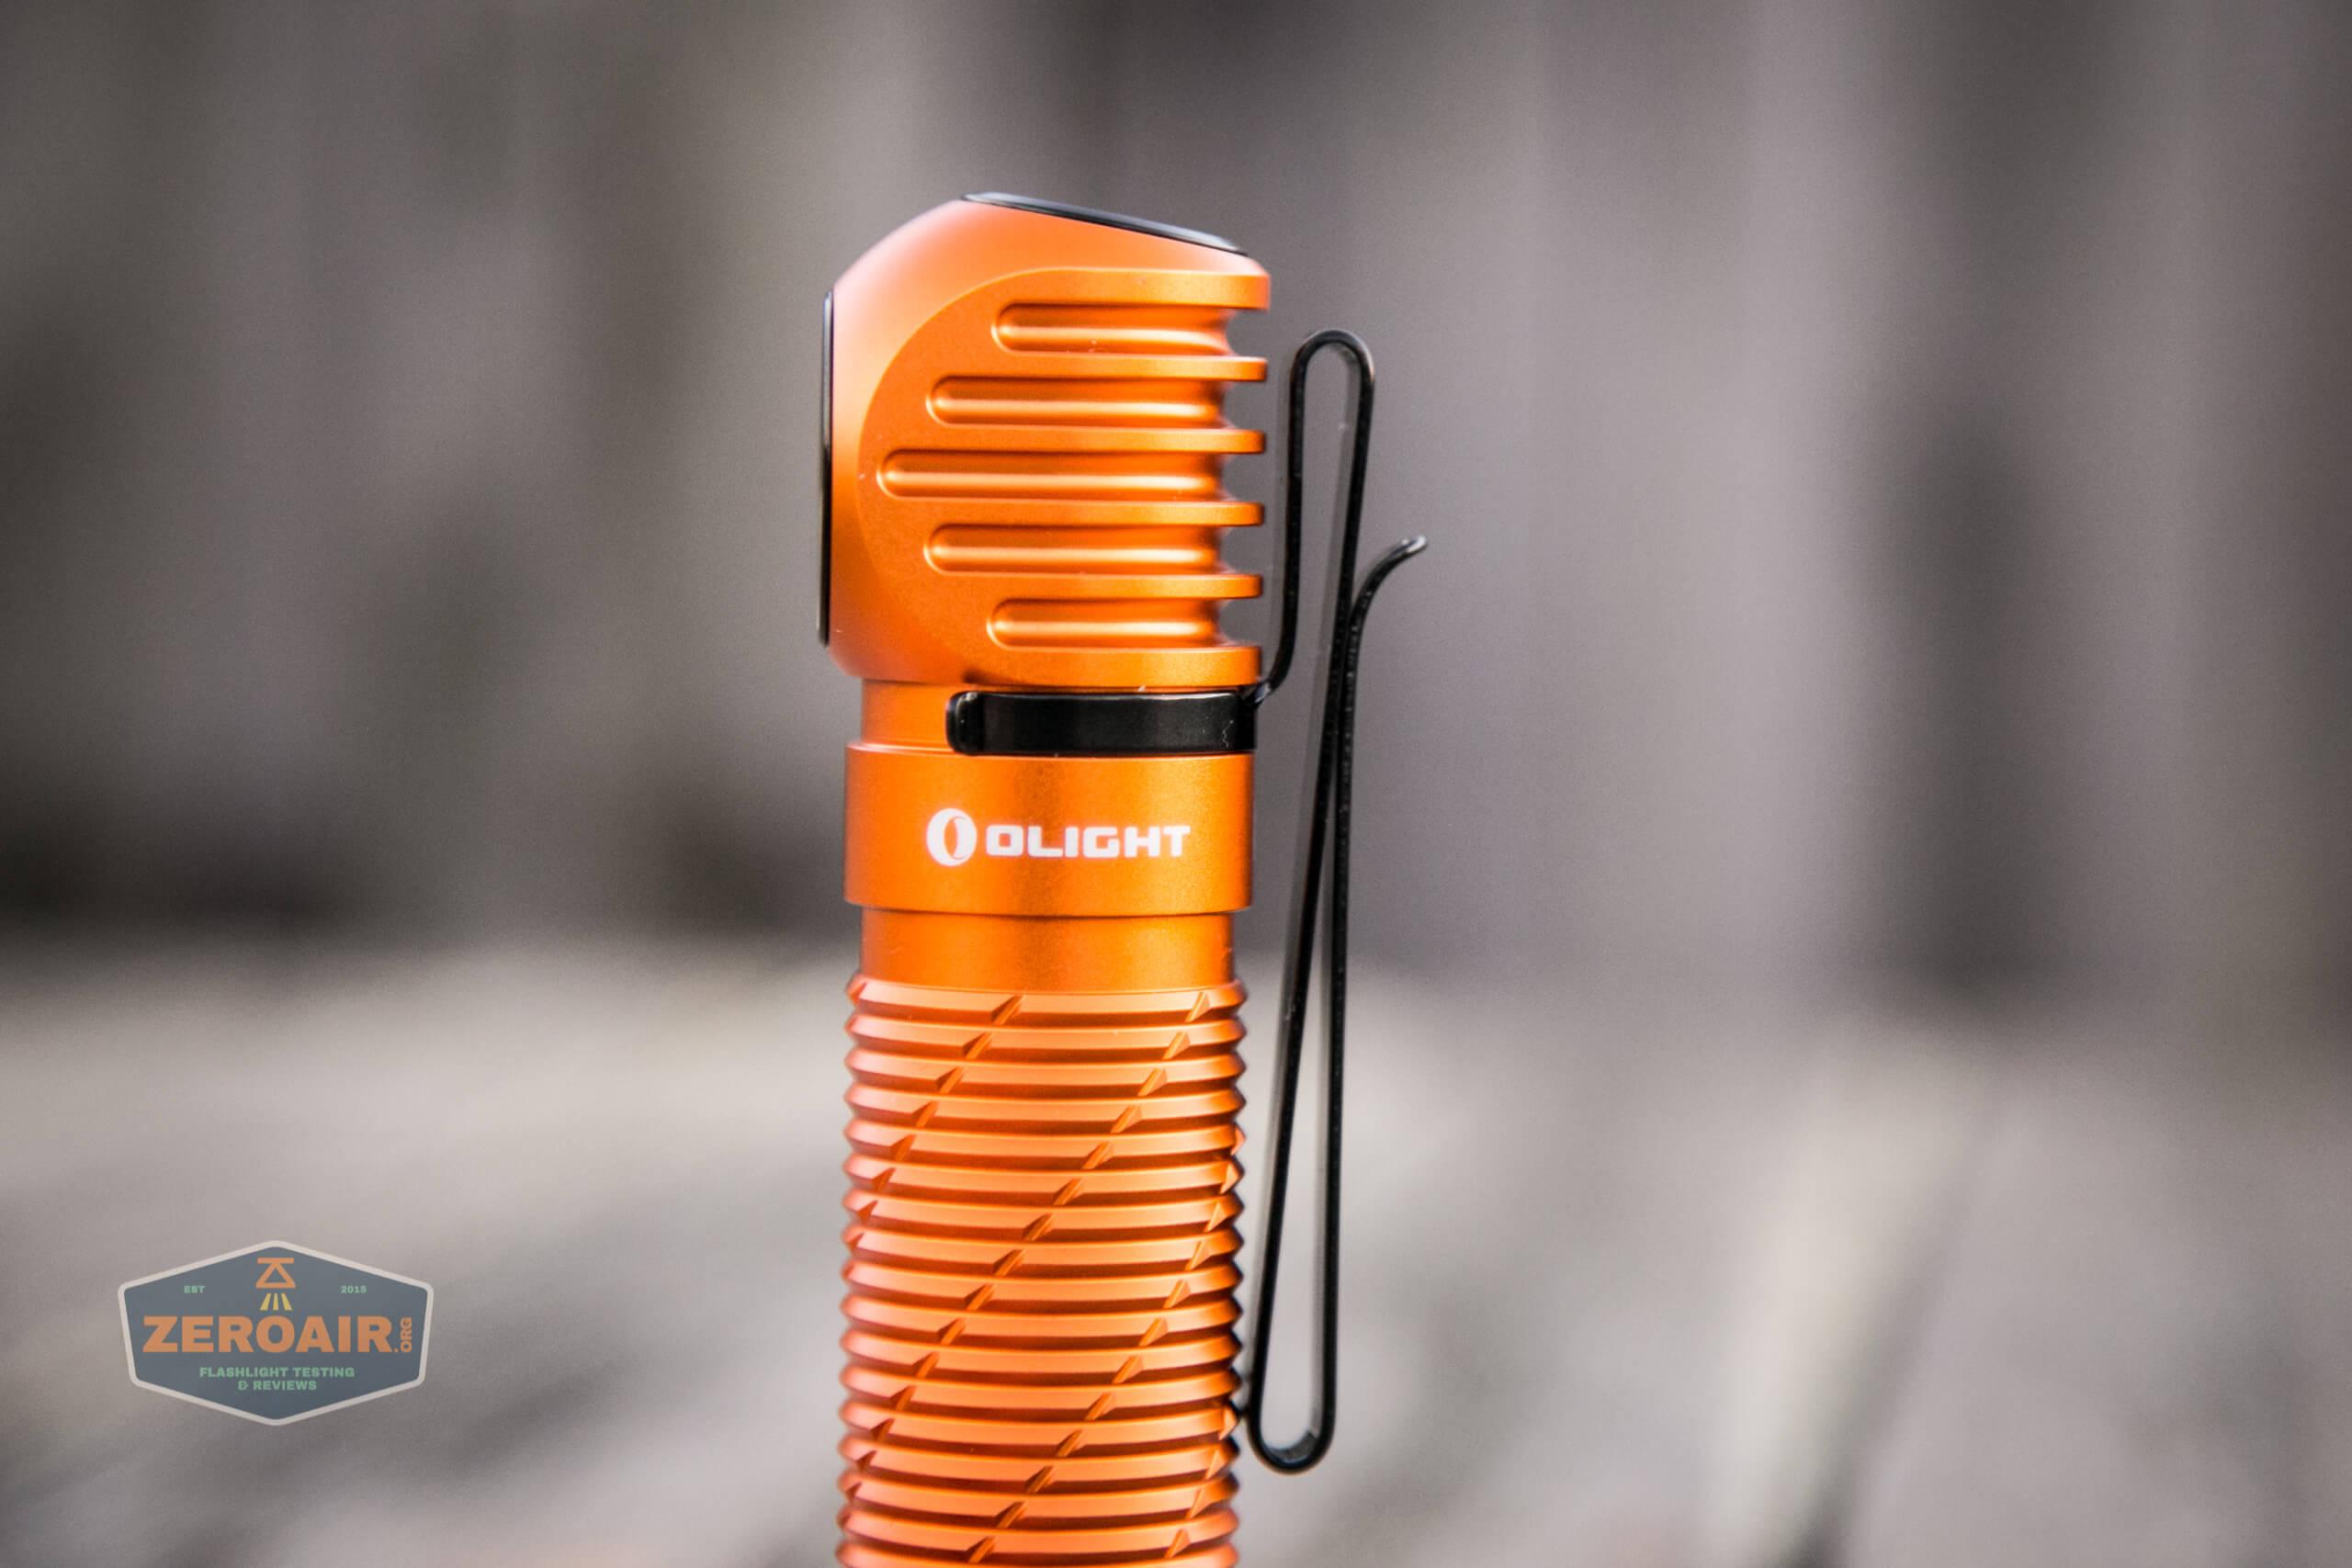 olight perun 2 21700 headlamp orange pocket clip